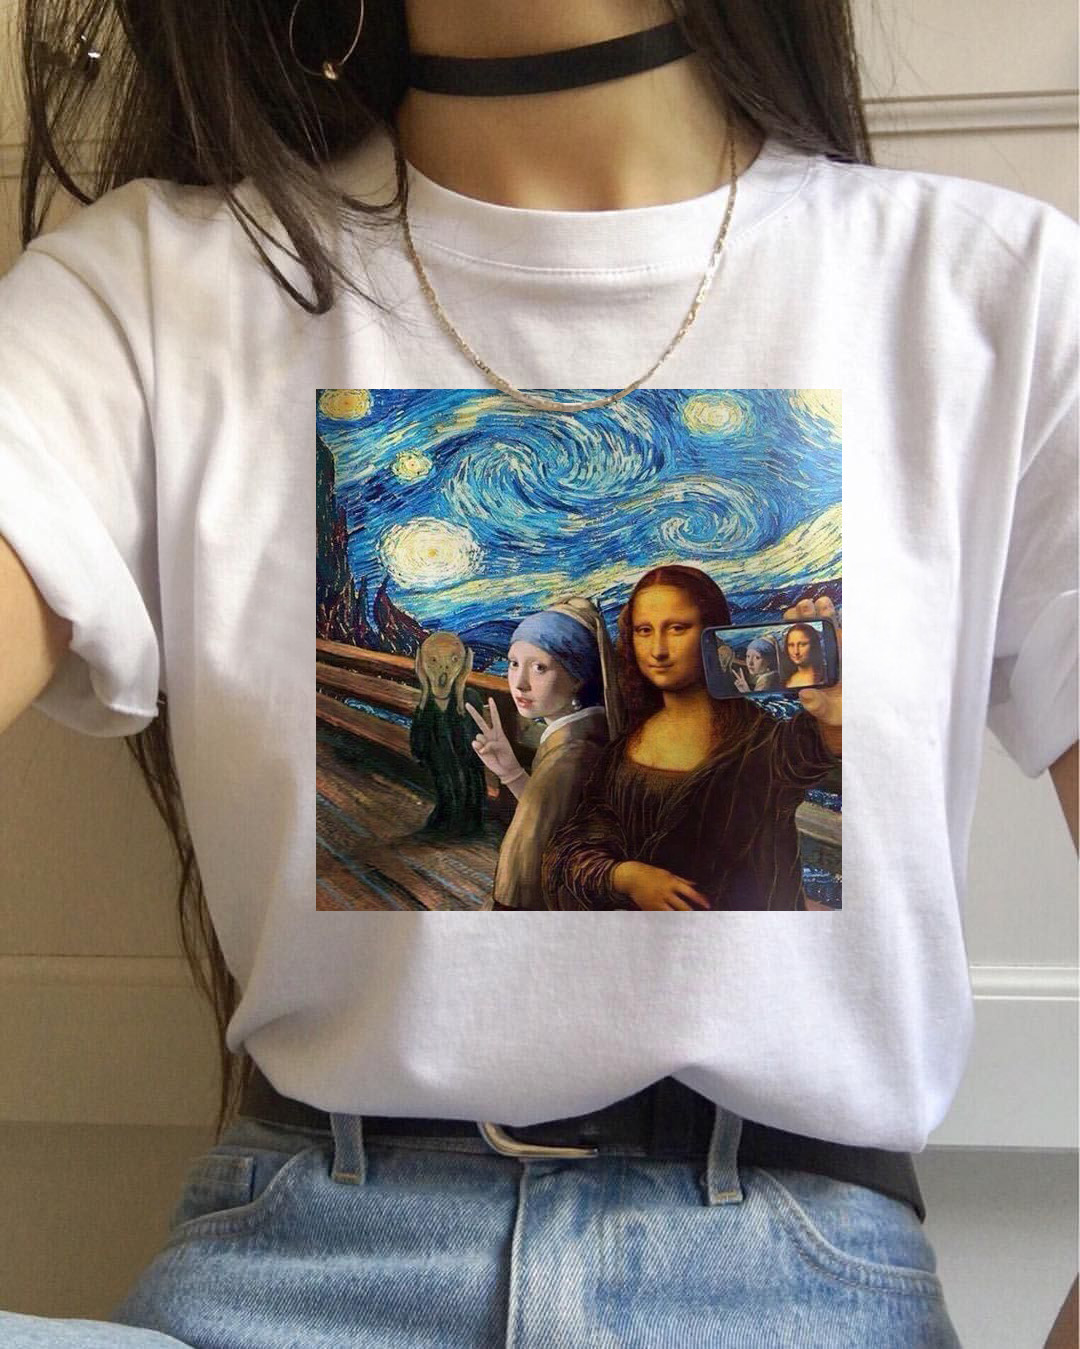 Mona Lisa T Shirt Women Van Gogh Funny Top Tee Tshirt Vogue Harajuku 90s Streetwear Sailor Moon Casual Printed T-shirt Female